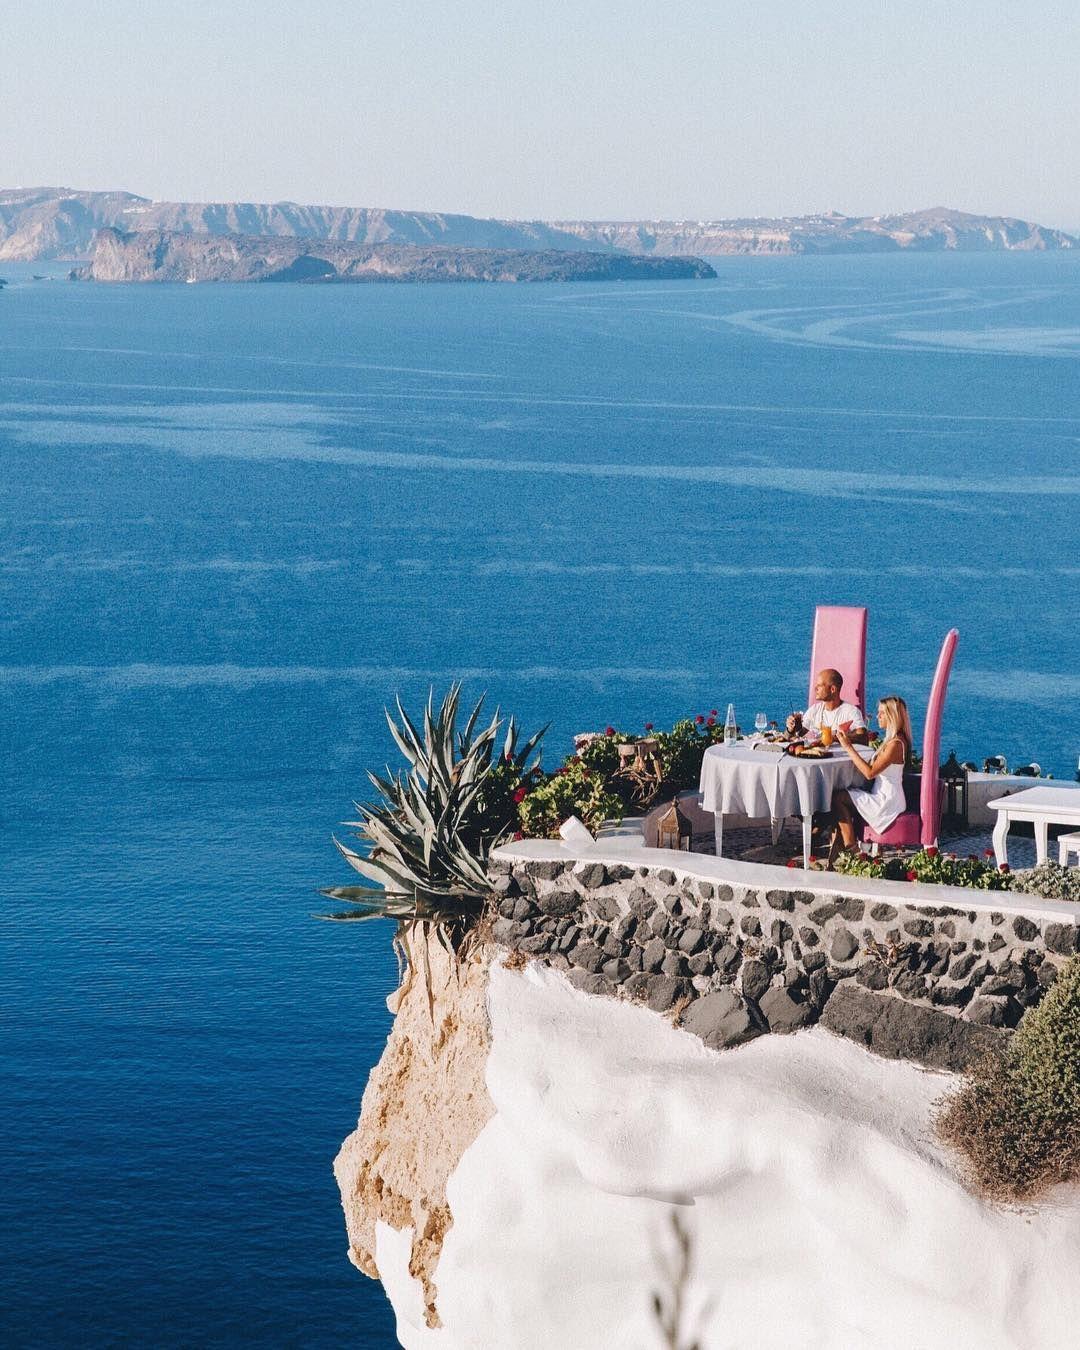 19 Most Romantic Honeymoon Destinations In The World (avec